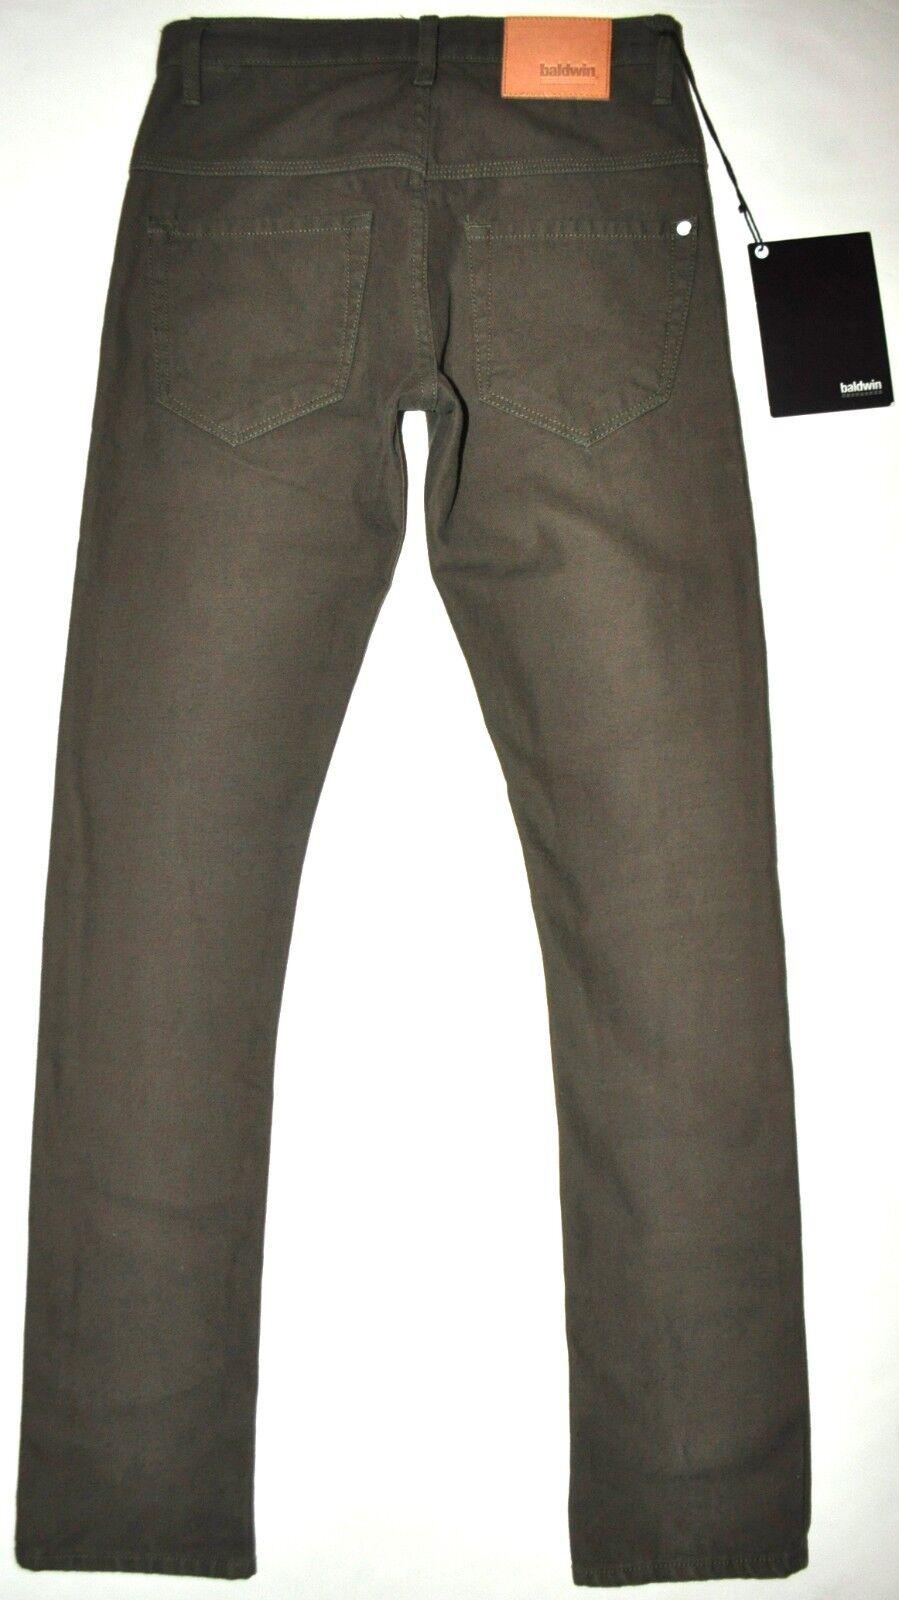 NEW Baldwin 77 Bull Olive Drop Yoke Straight Jeans Pants 29 X 33 3 4 Long RARE